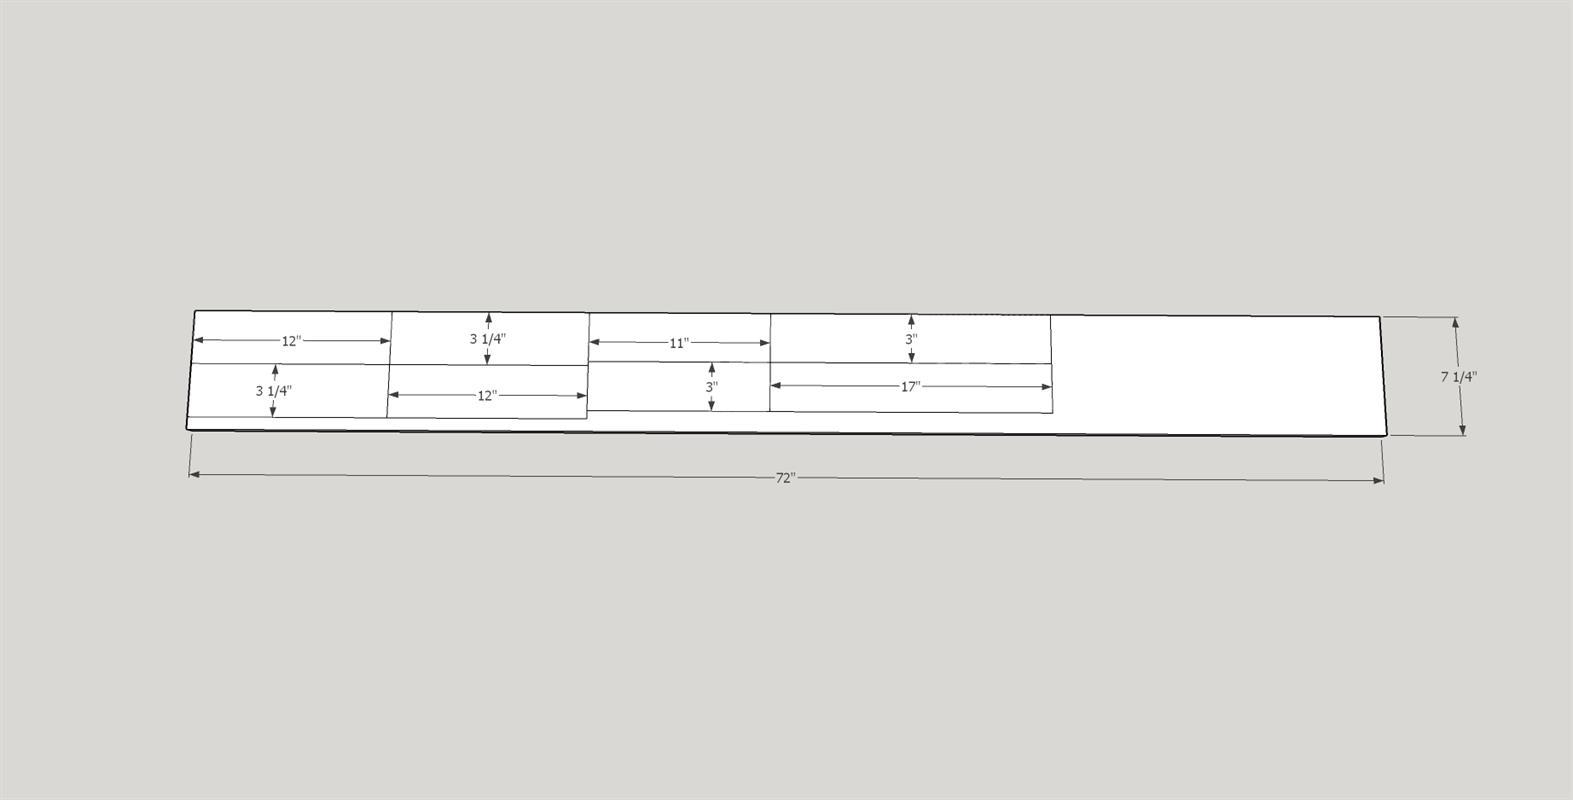 tile-night-stand-board-cut-diagram